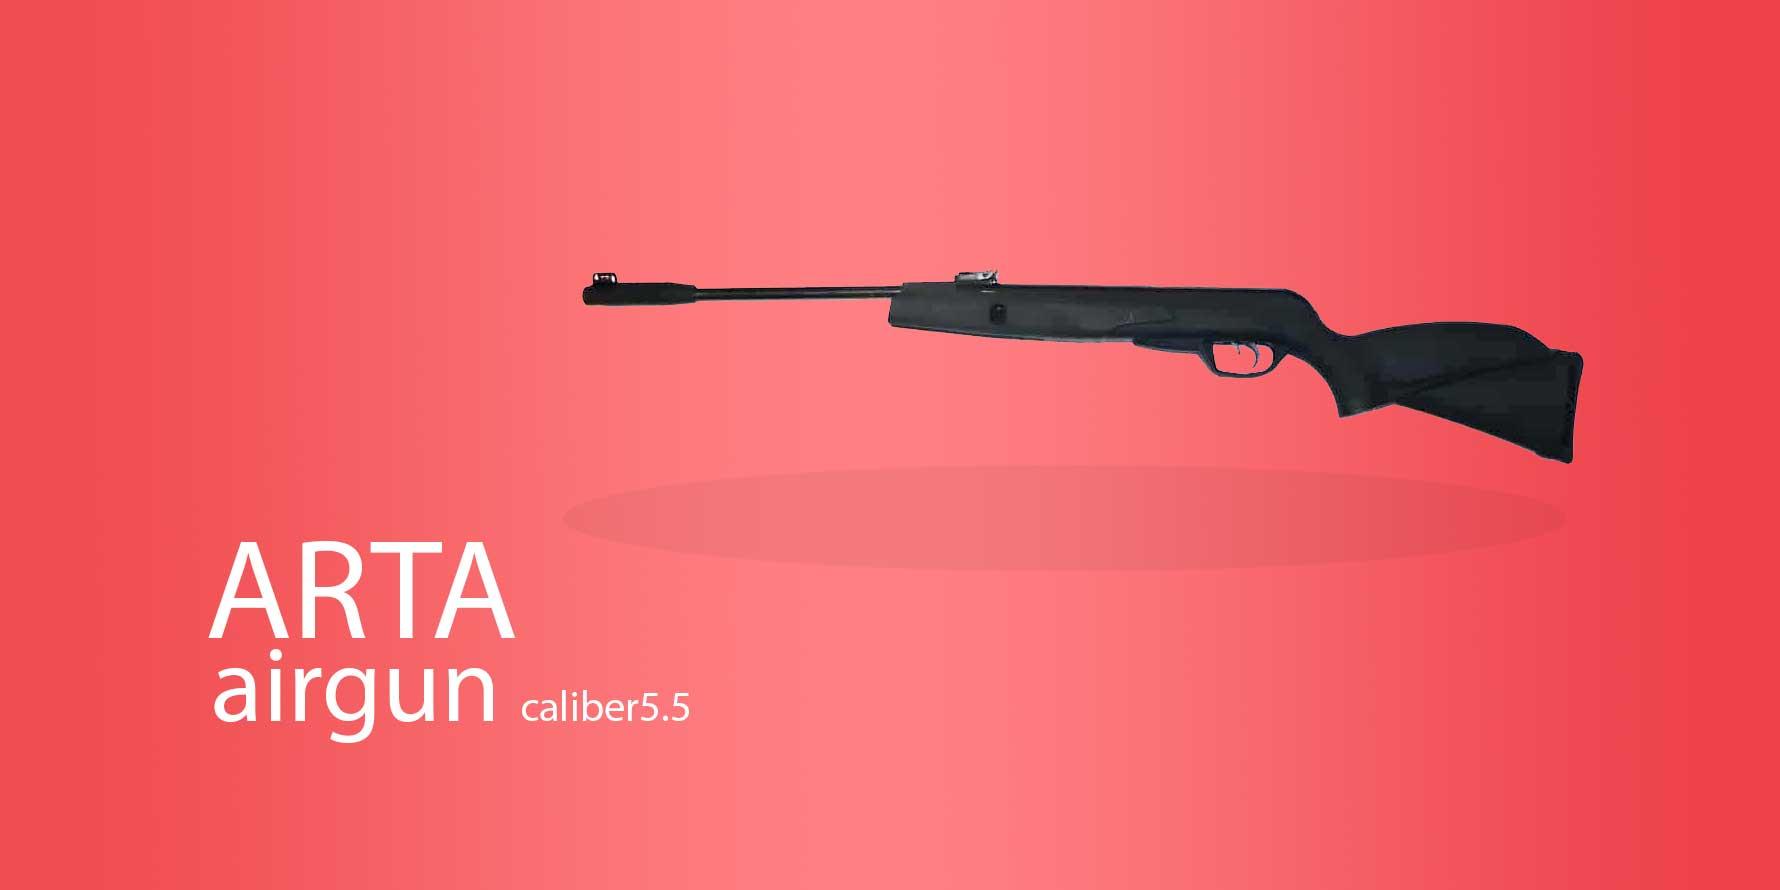 تفنگ بادی آرتا کالیبر 5.5